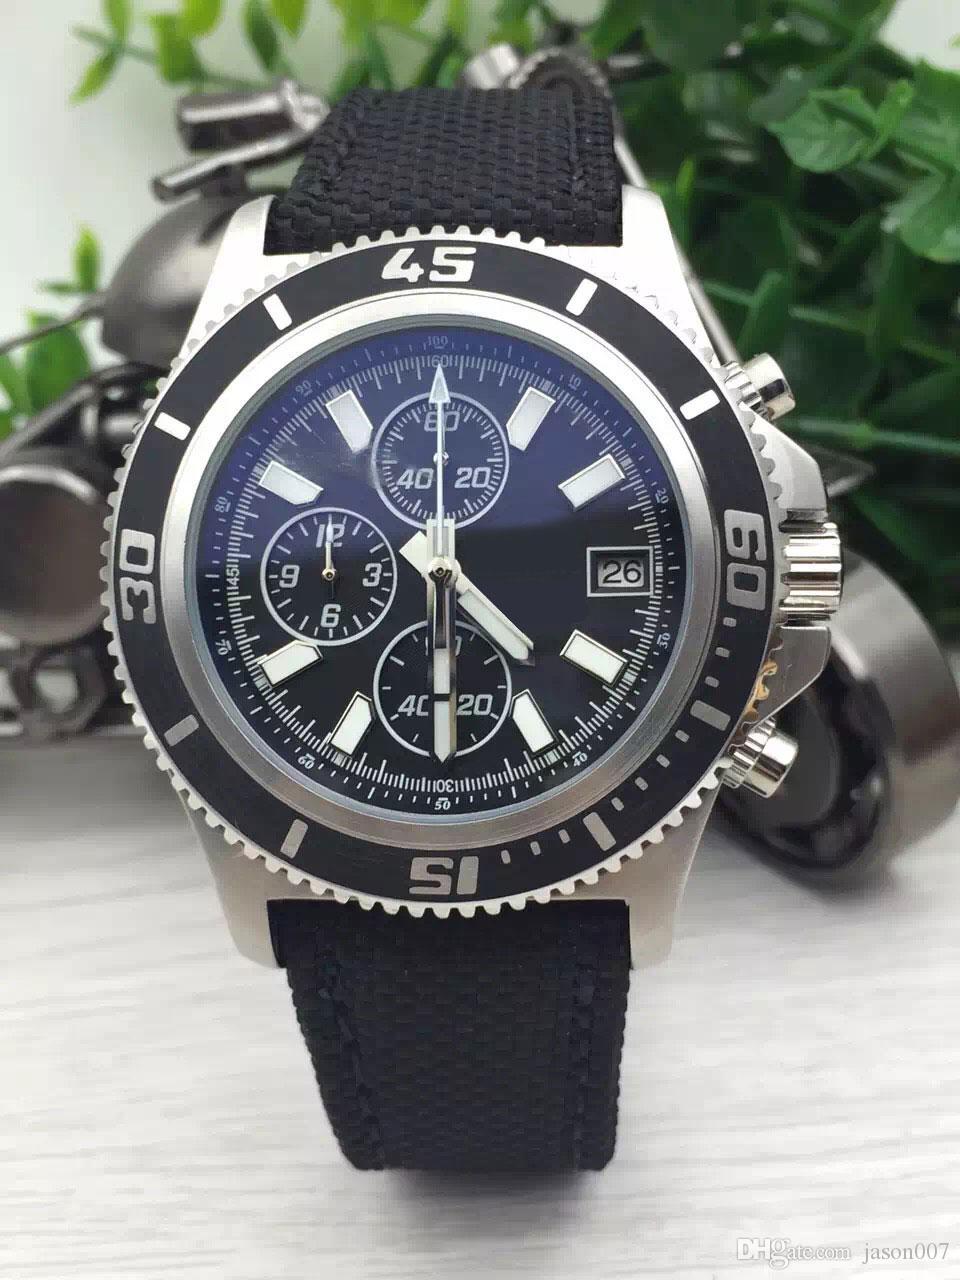 Wrist watches brands for mens - Dhgate Top Seller Brand Watches Men Superocean Ii Heritage 46 Watch Nylon Belt Watch Quartz Chronograph